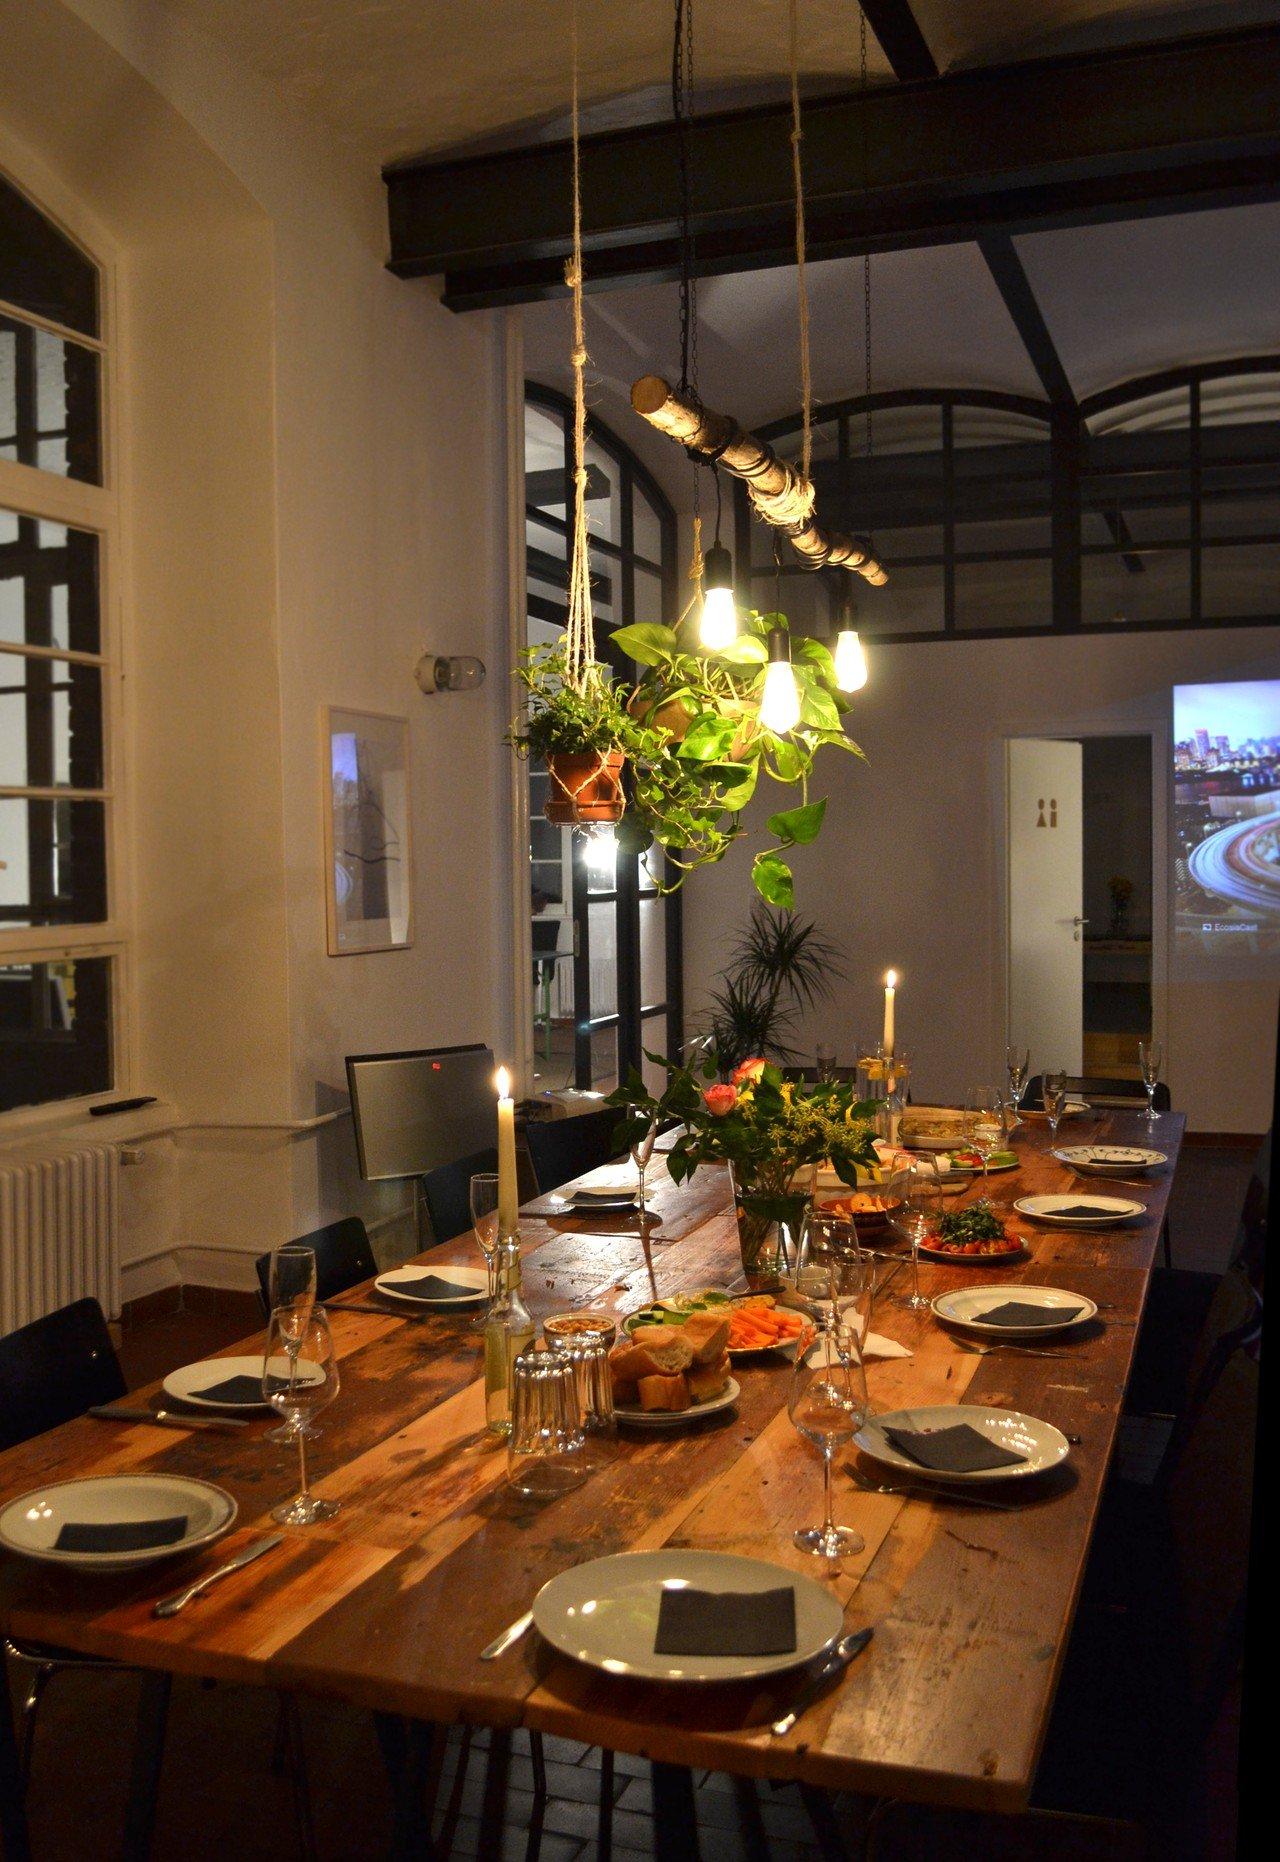 ecosia open space mieten in berlin. Black Bedroom Furniture Sets. Home Design Ideas